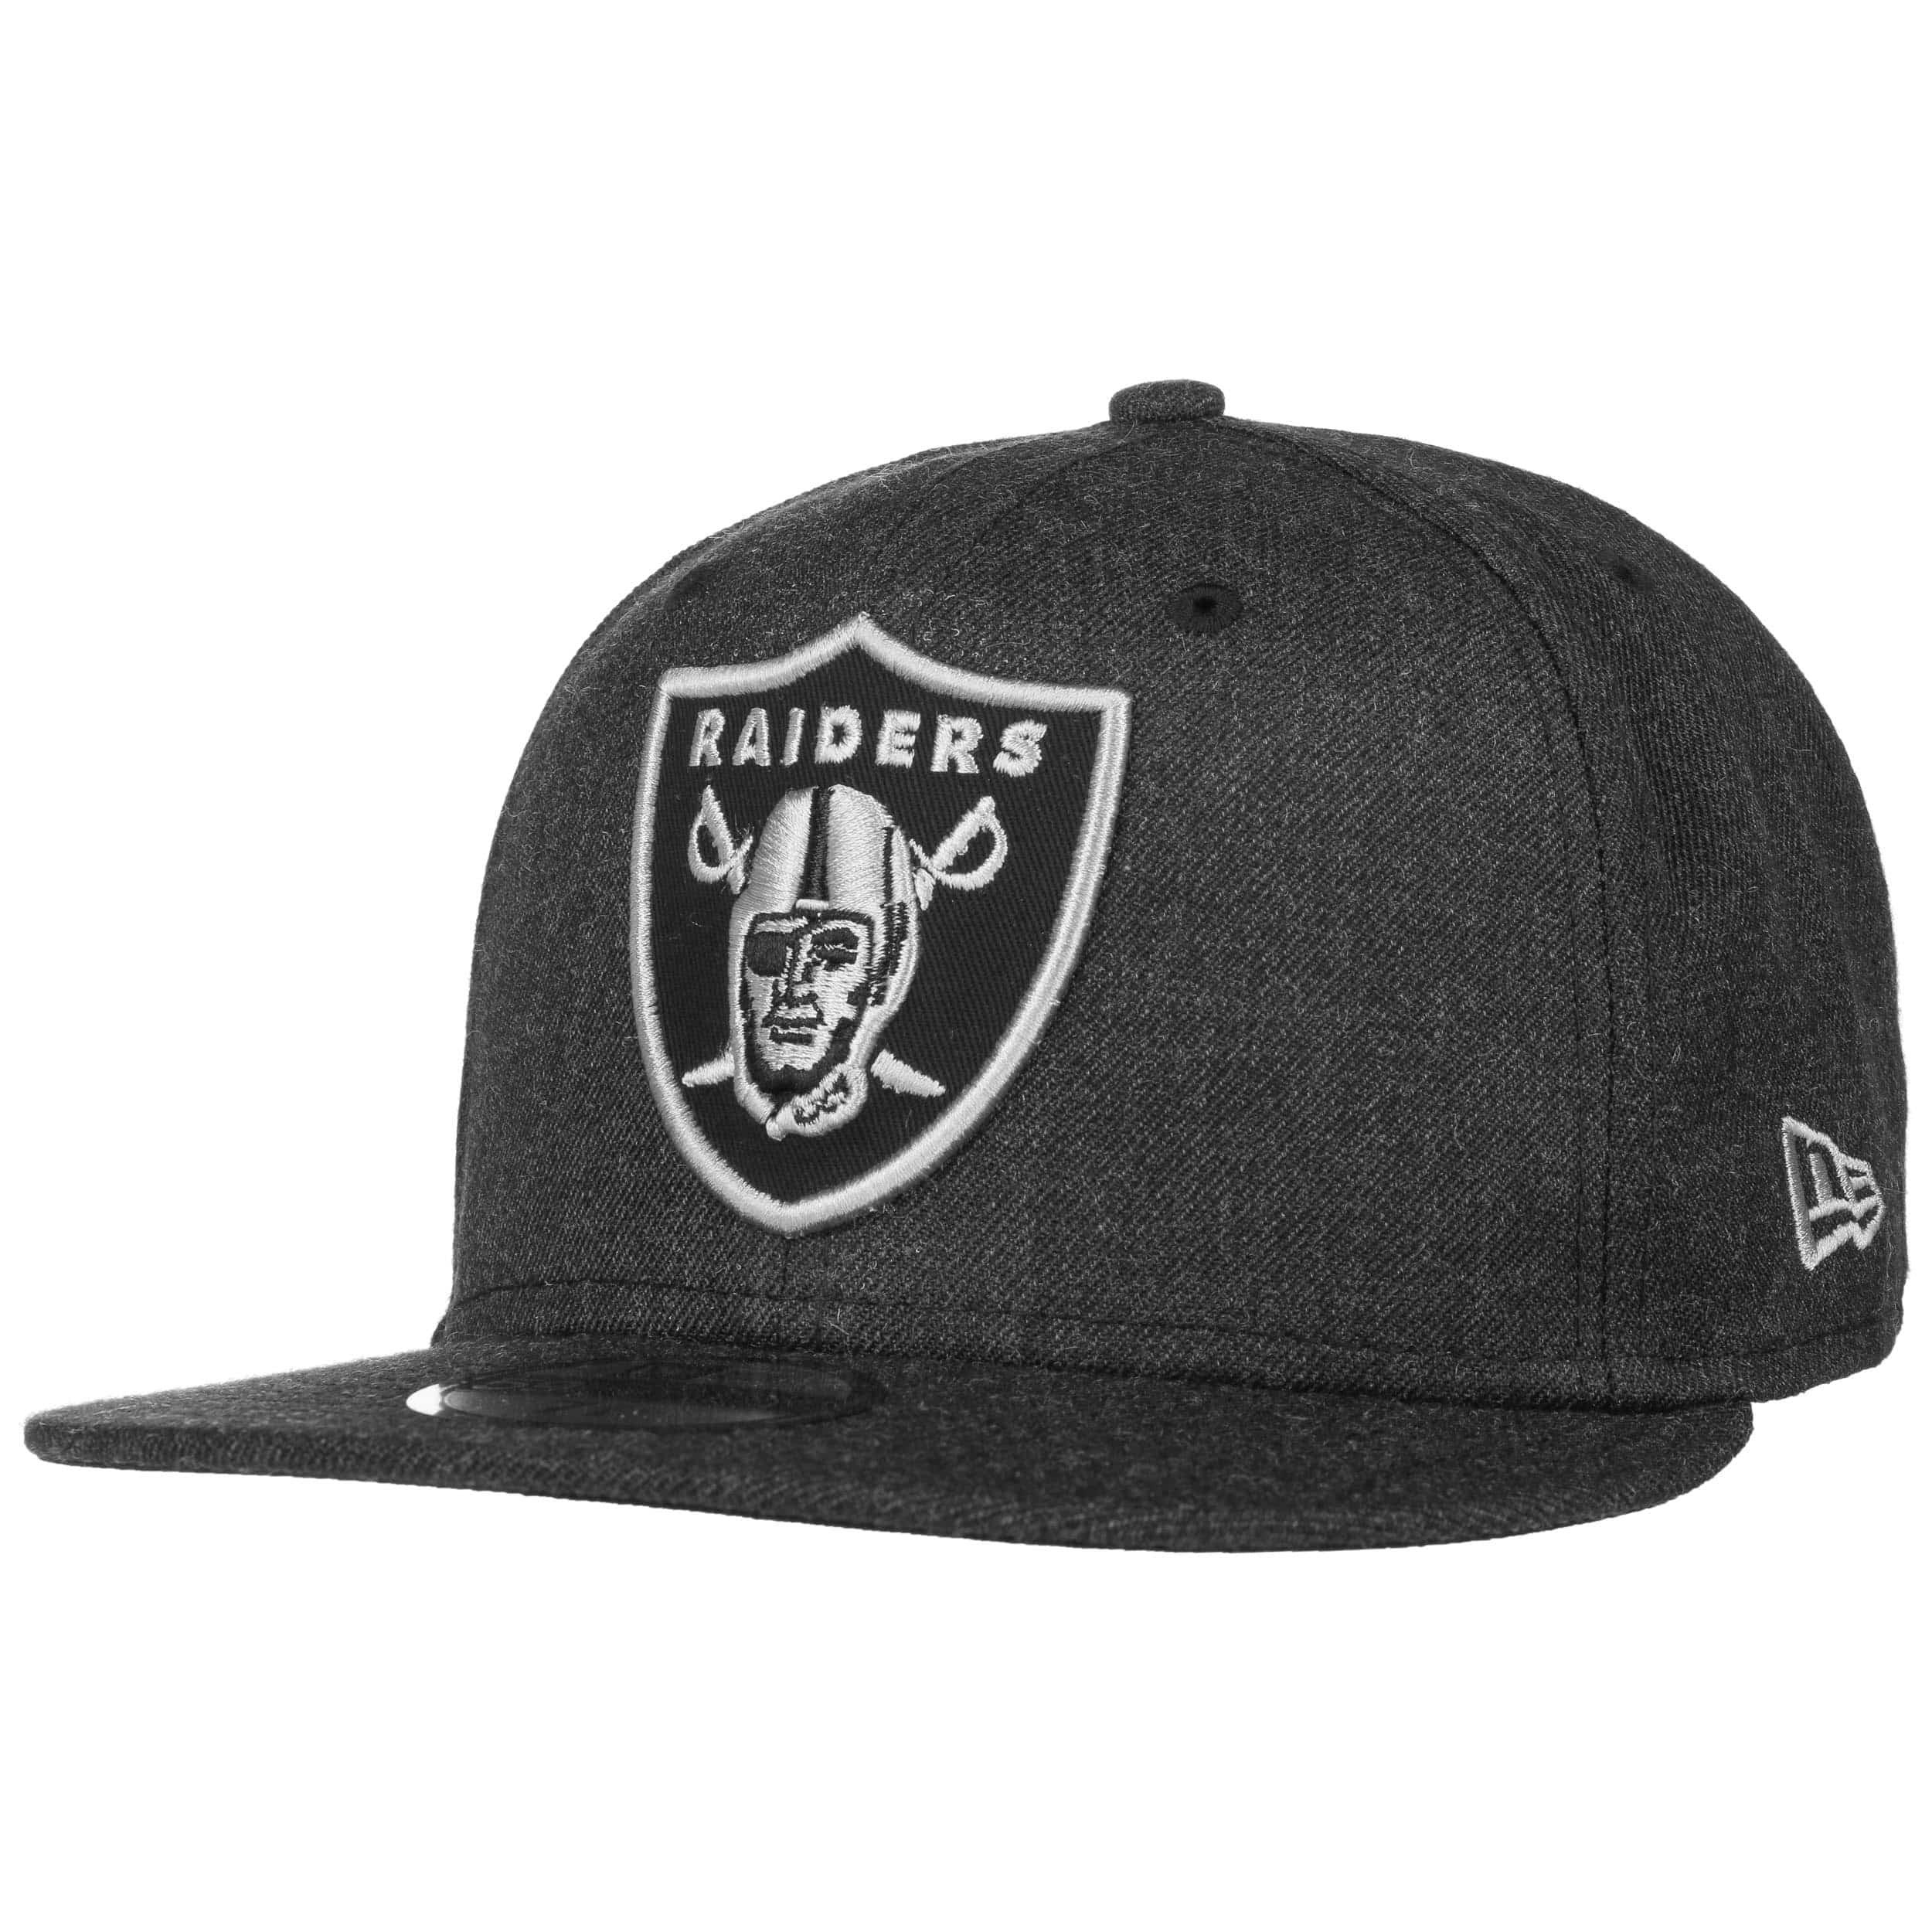 59Fifty NFL Heather Raiders Cap. by New Era f93c8a24e95